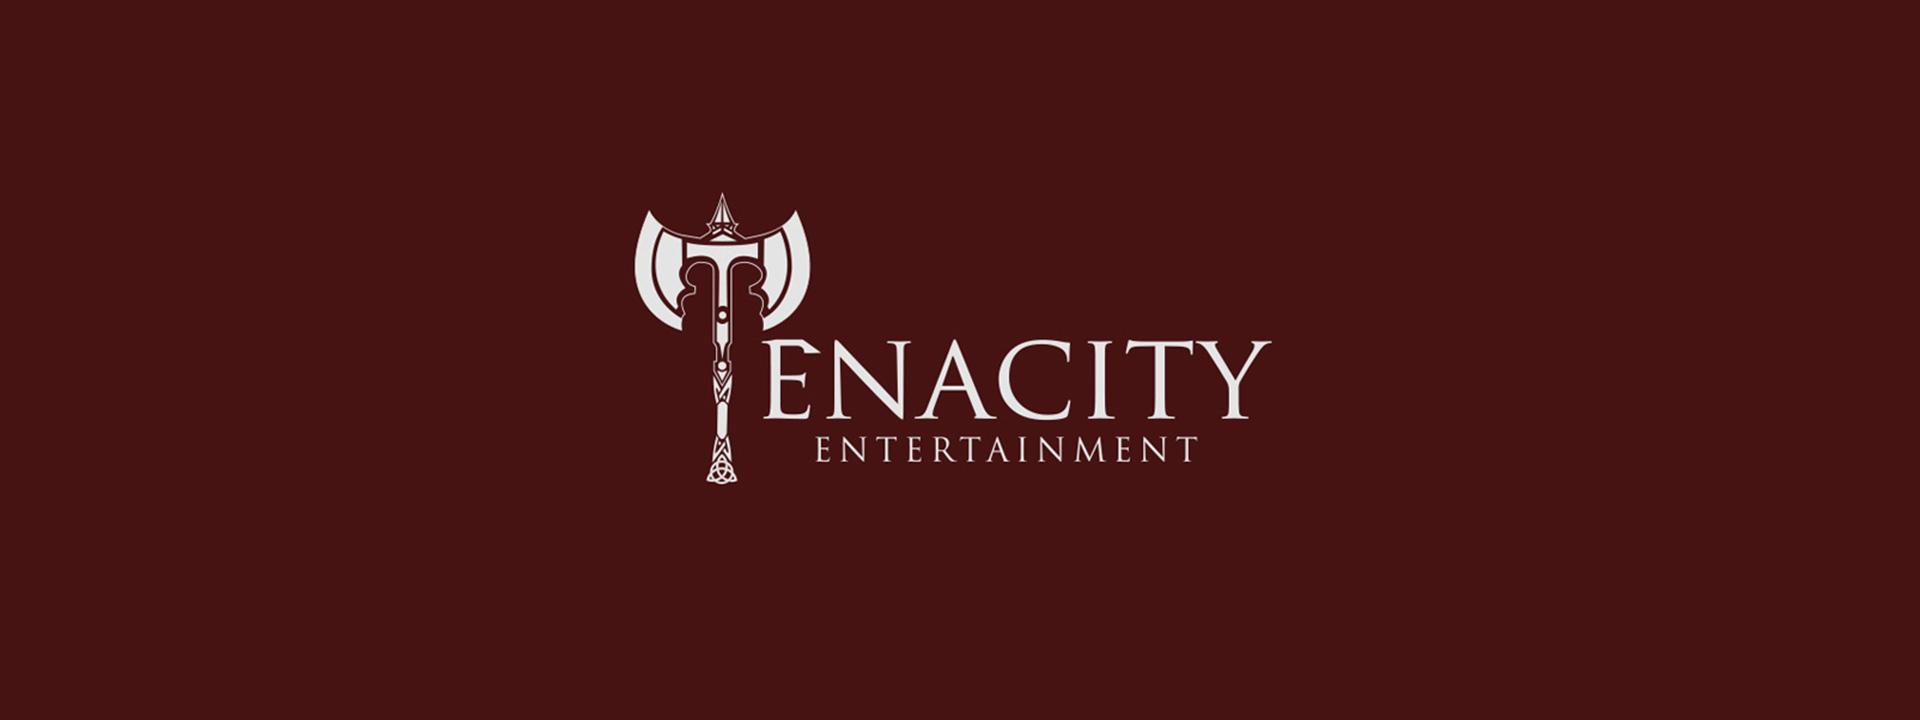 tenacity entertainment identity design production